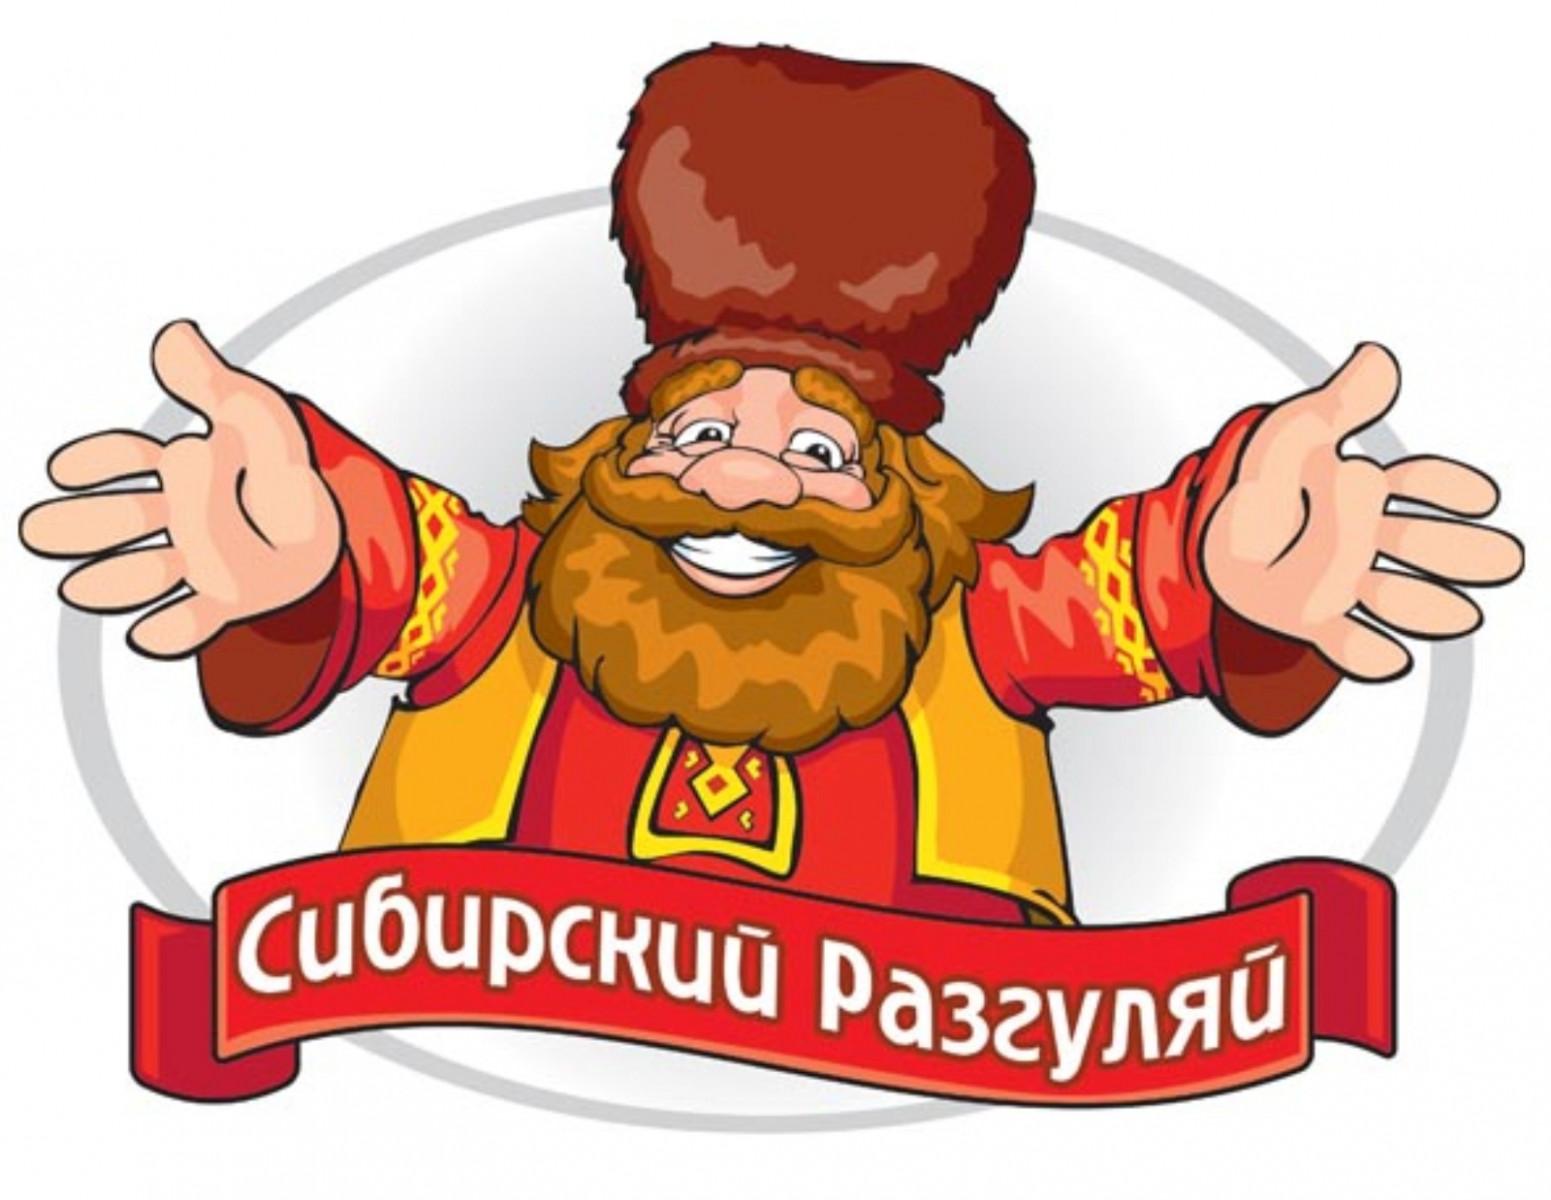 Регистрация товарного знака «Сибирский разгуляй»